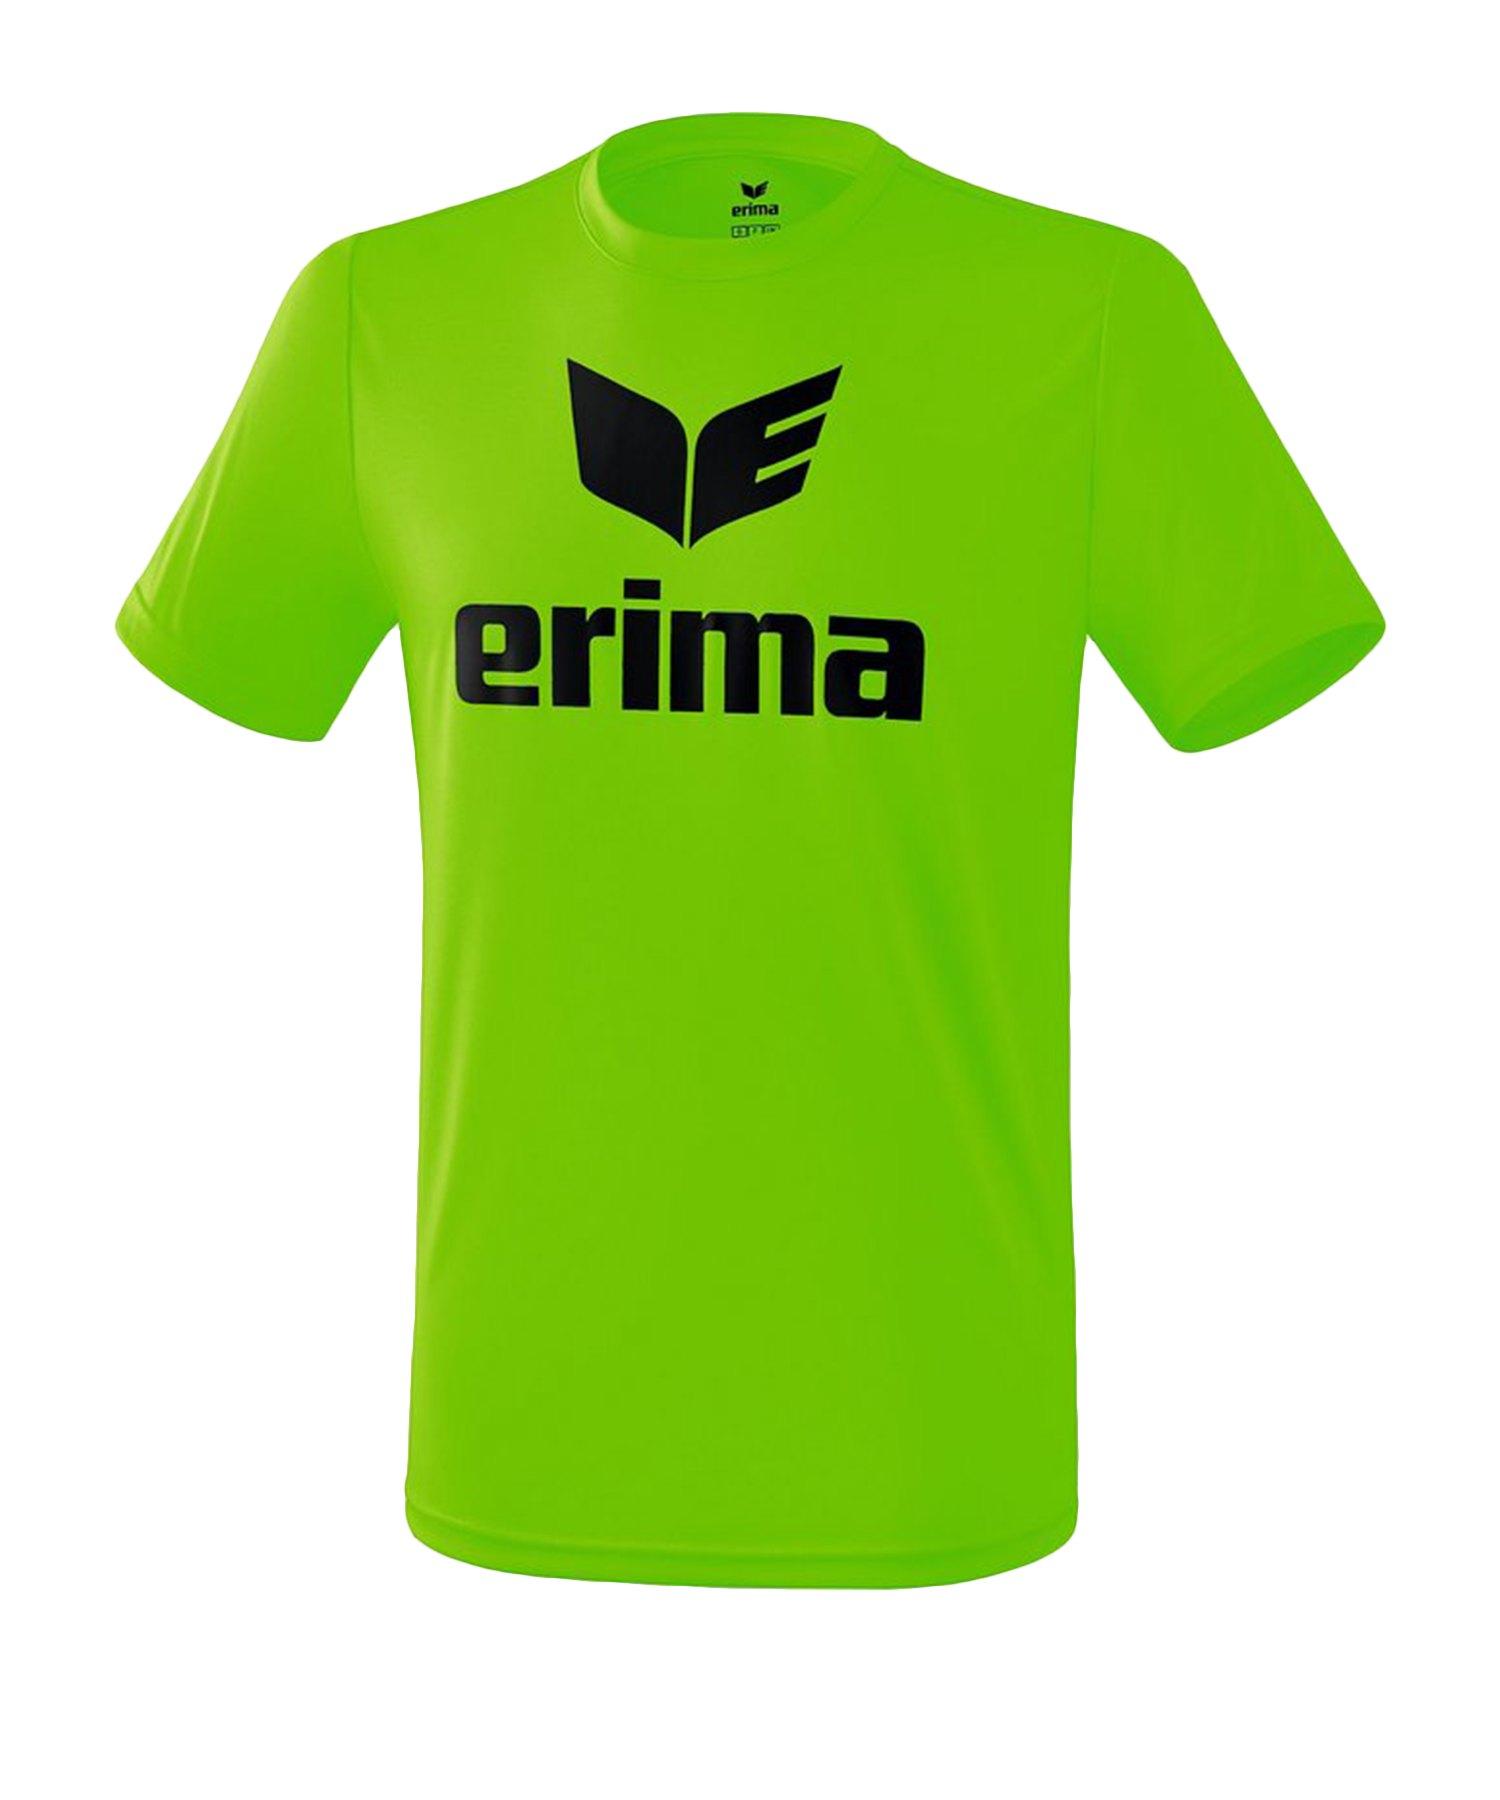 Erima Funktions Promo T-Shirt Grün Schwarz - Gruen